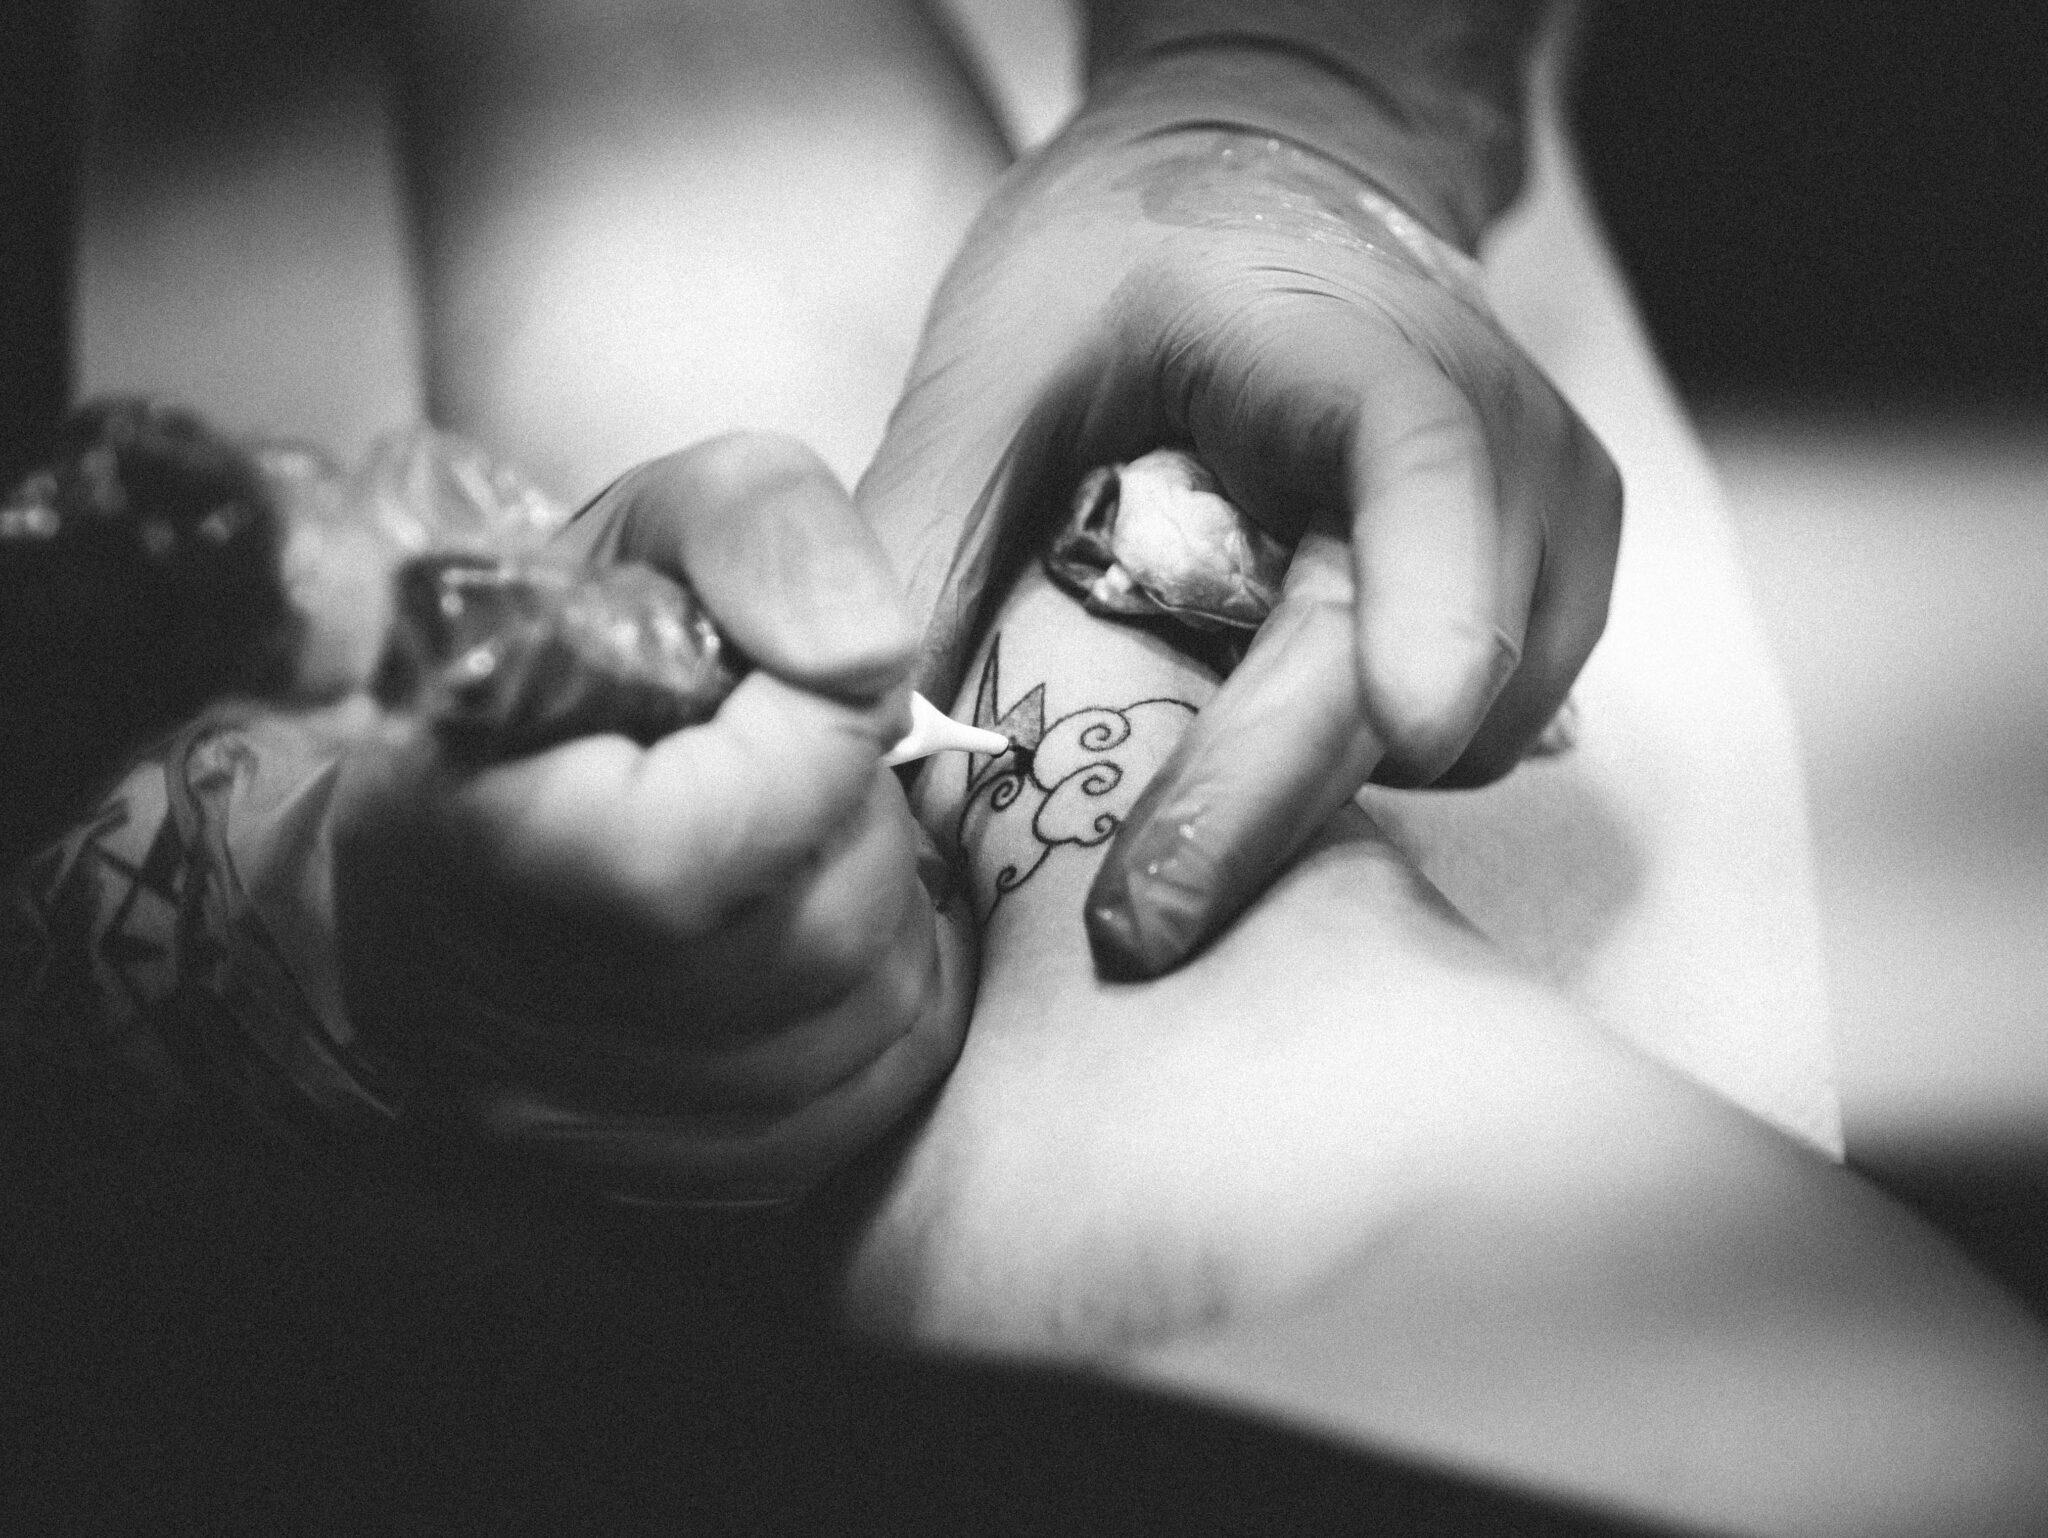 Snip Art tattoo website